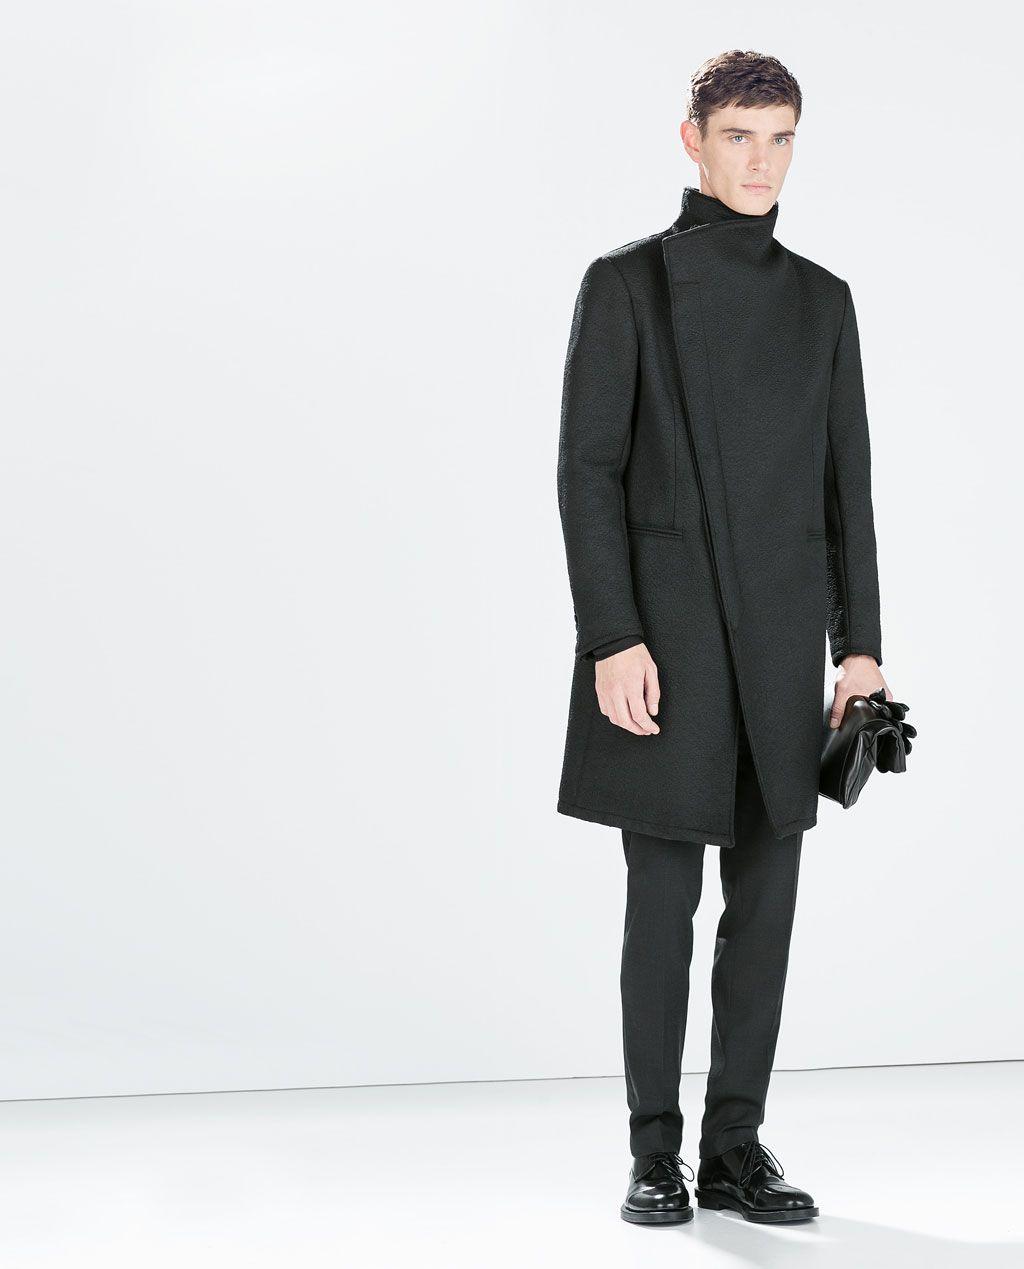 Image 1 de MANTEAU COULEUR MARENGO FANTAISIE de Zara | Wear